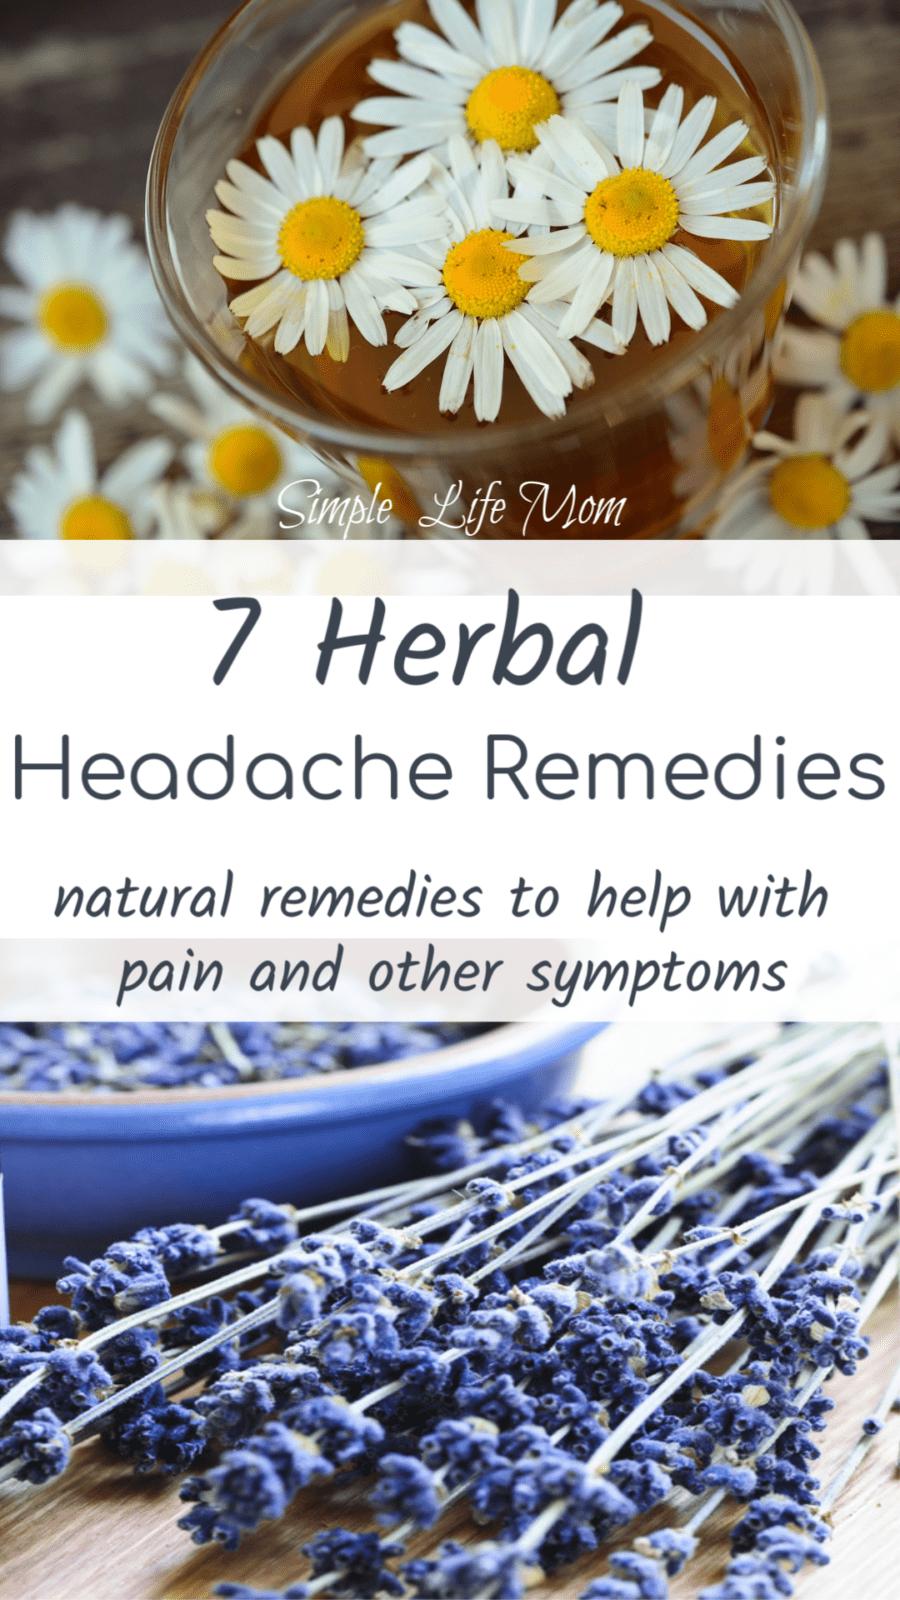 7 Herbal Headache Remedies